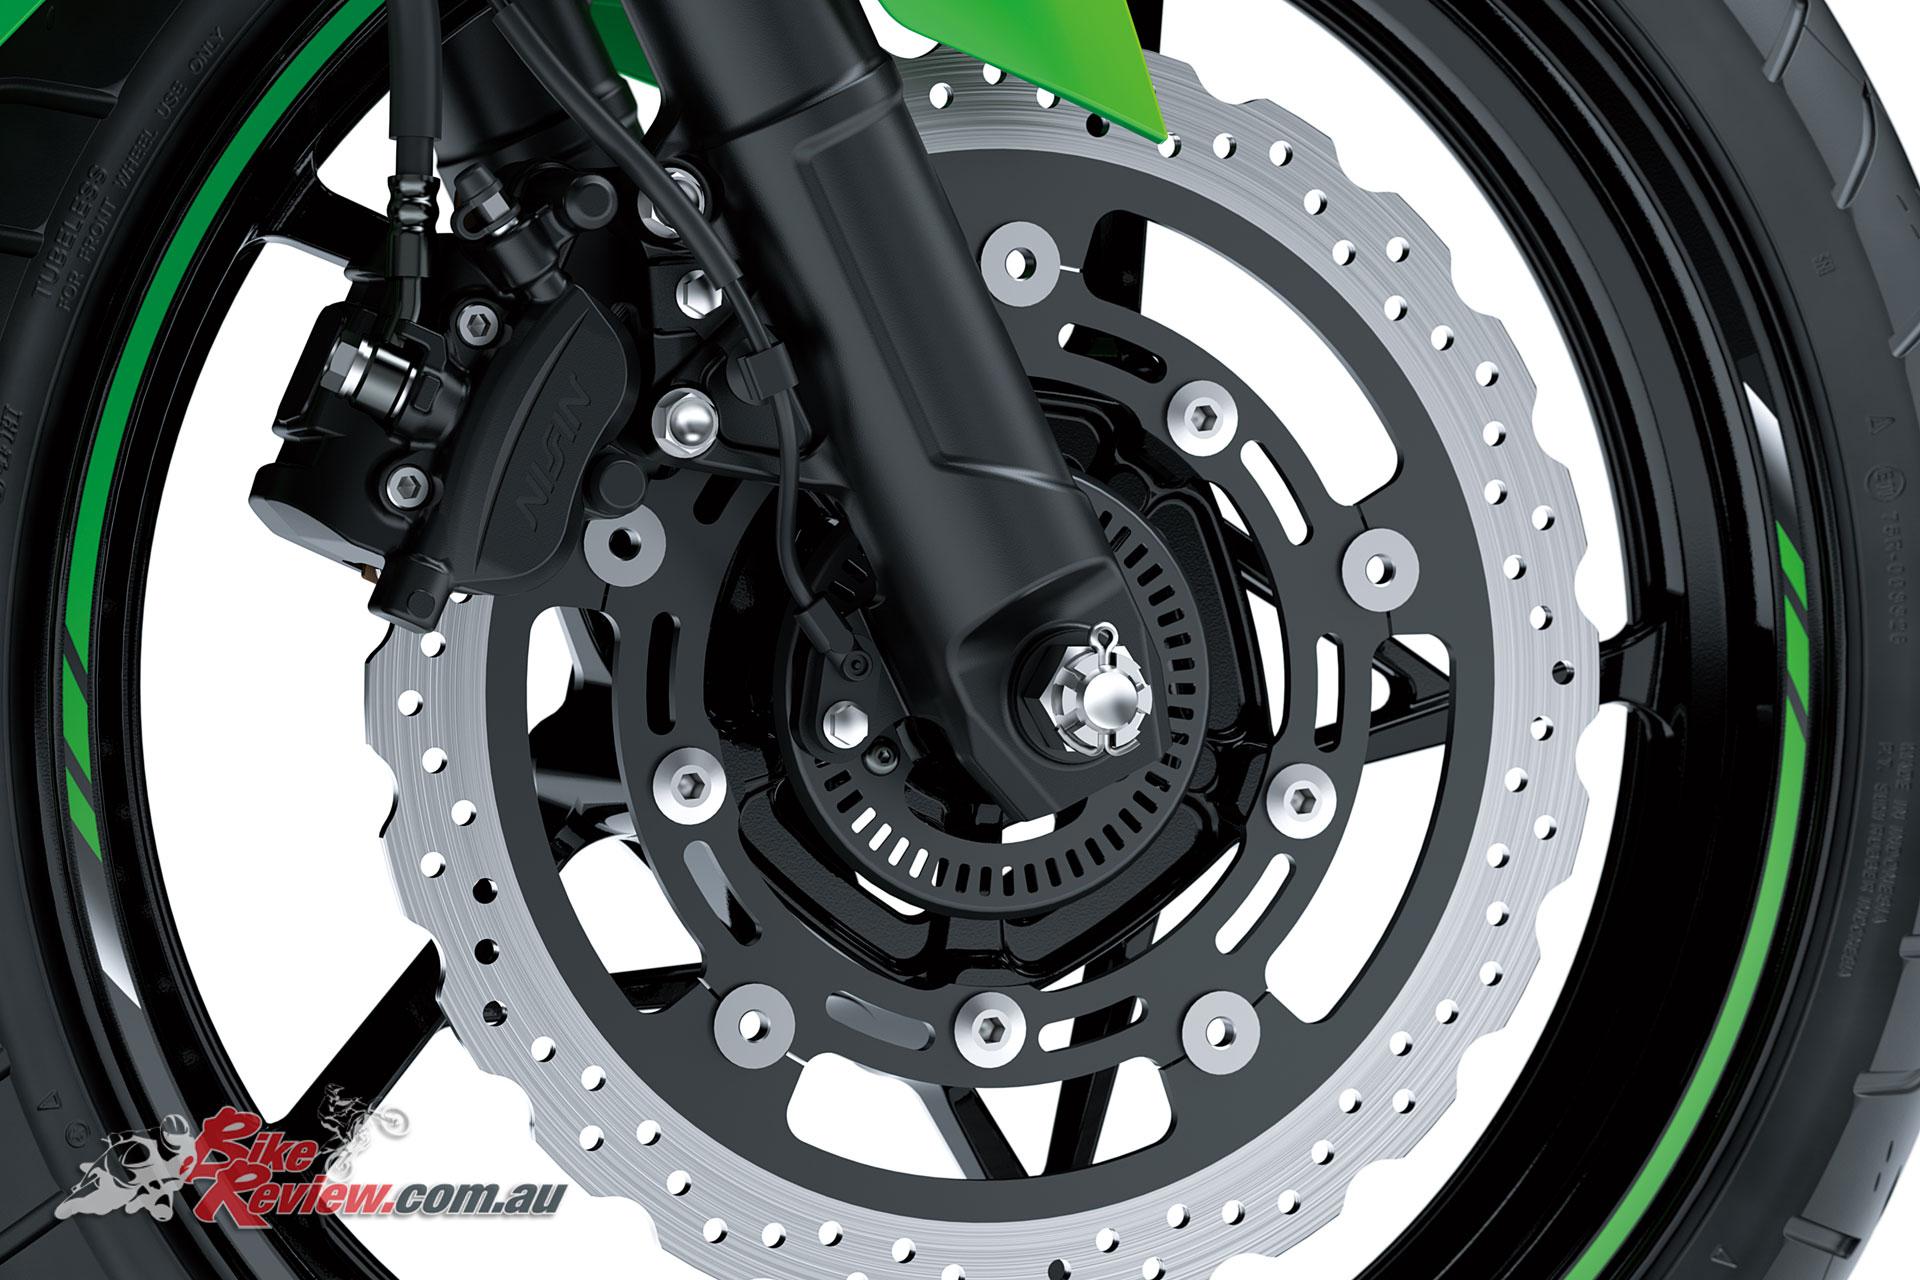 2018-Kawasaki-Ninja-400-LAMS-Bike-Review-EX400G-12